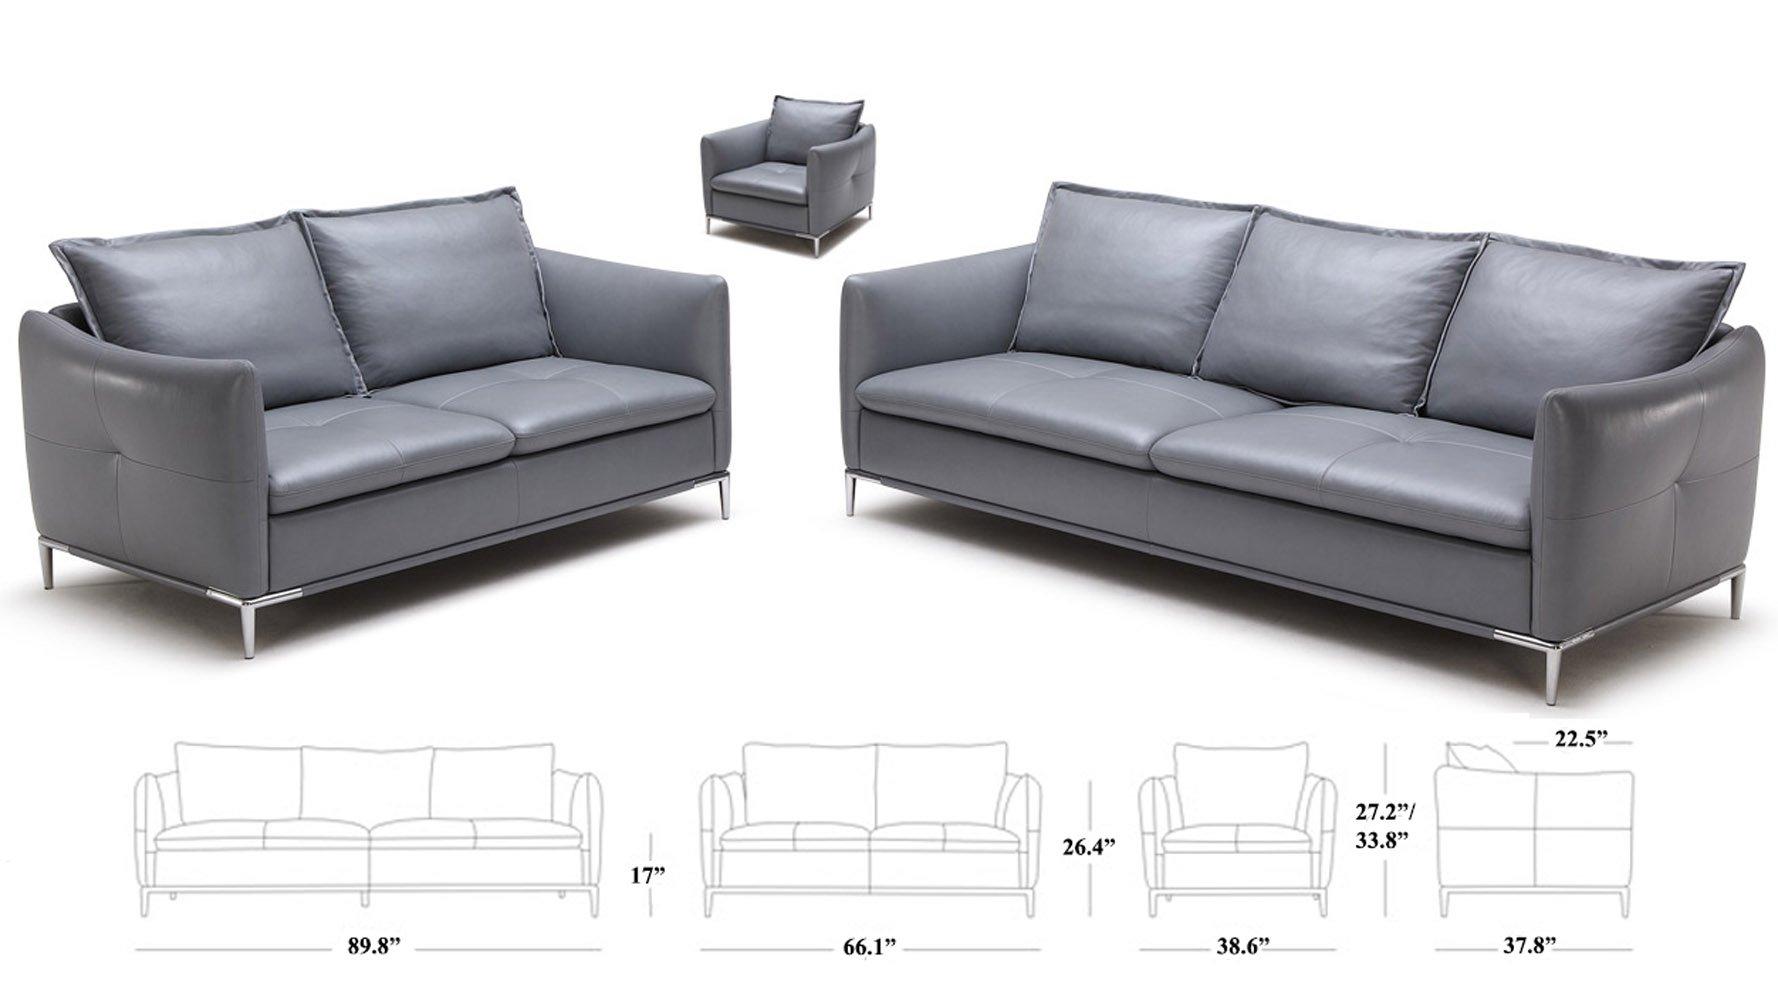 Grey Bristol Leather Sofa Set With